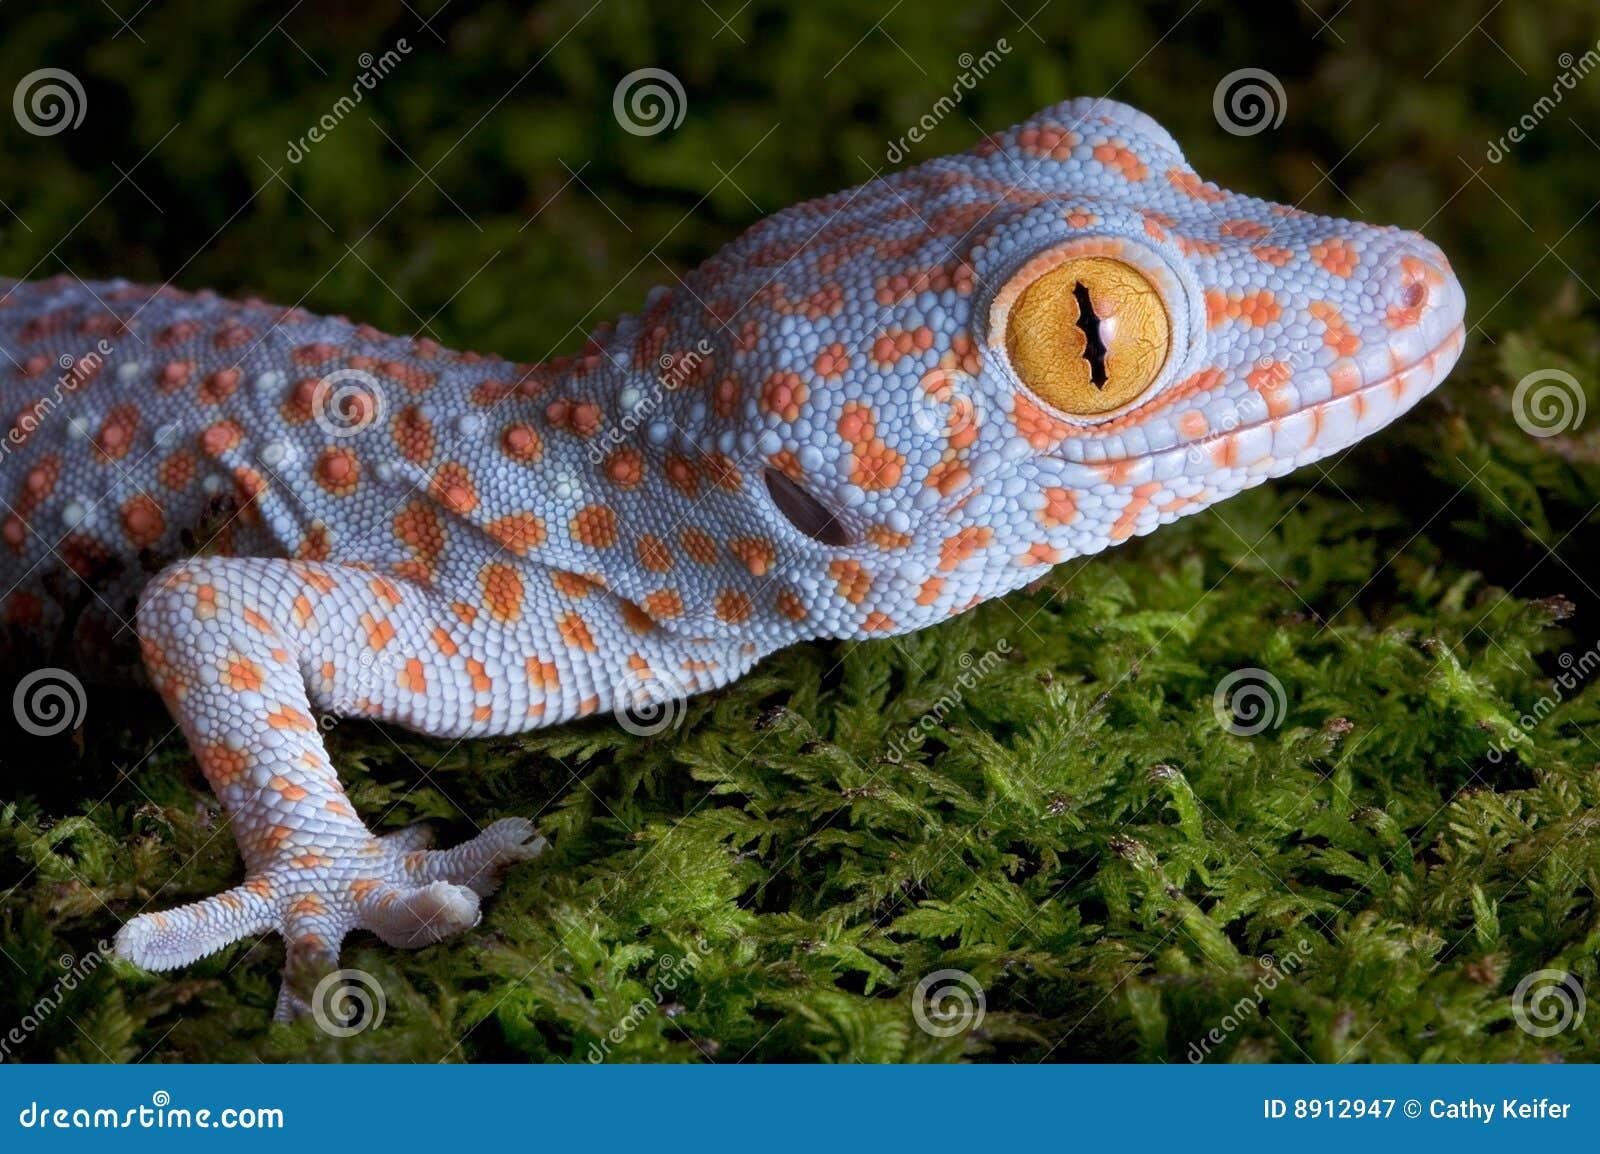 Tokay gecko close up